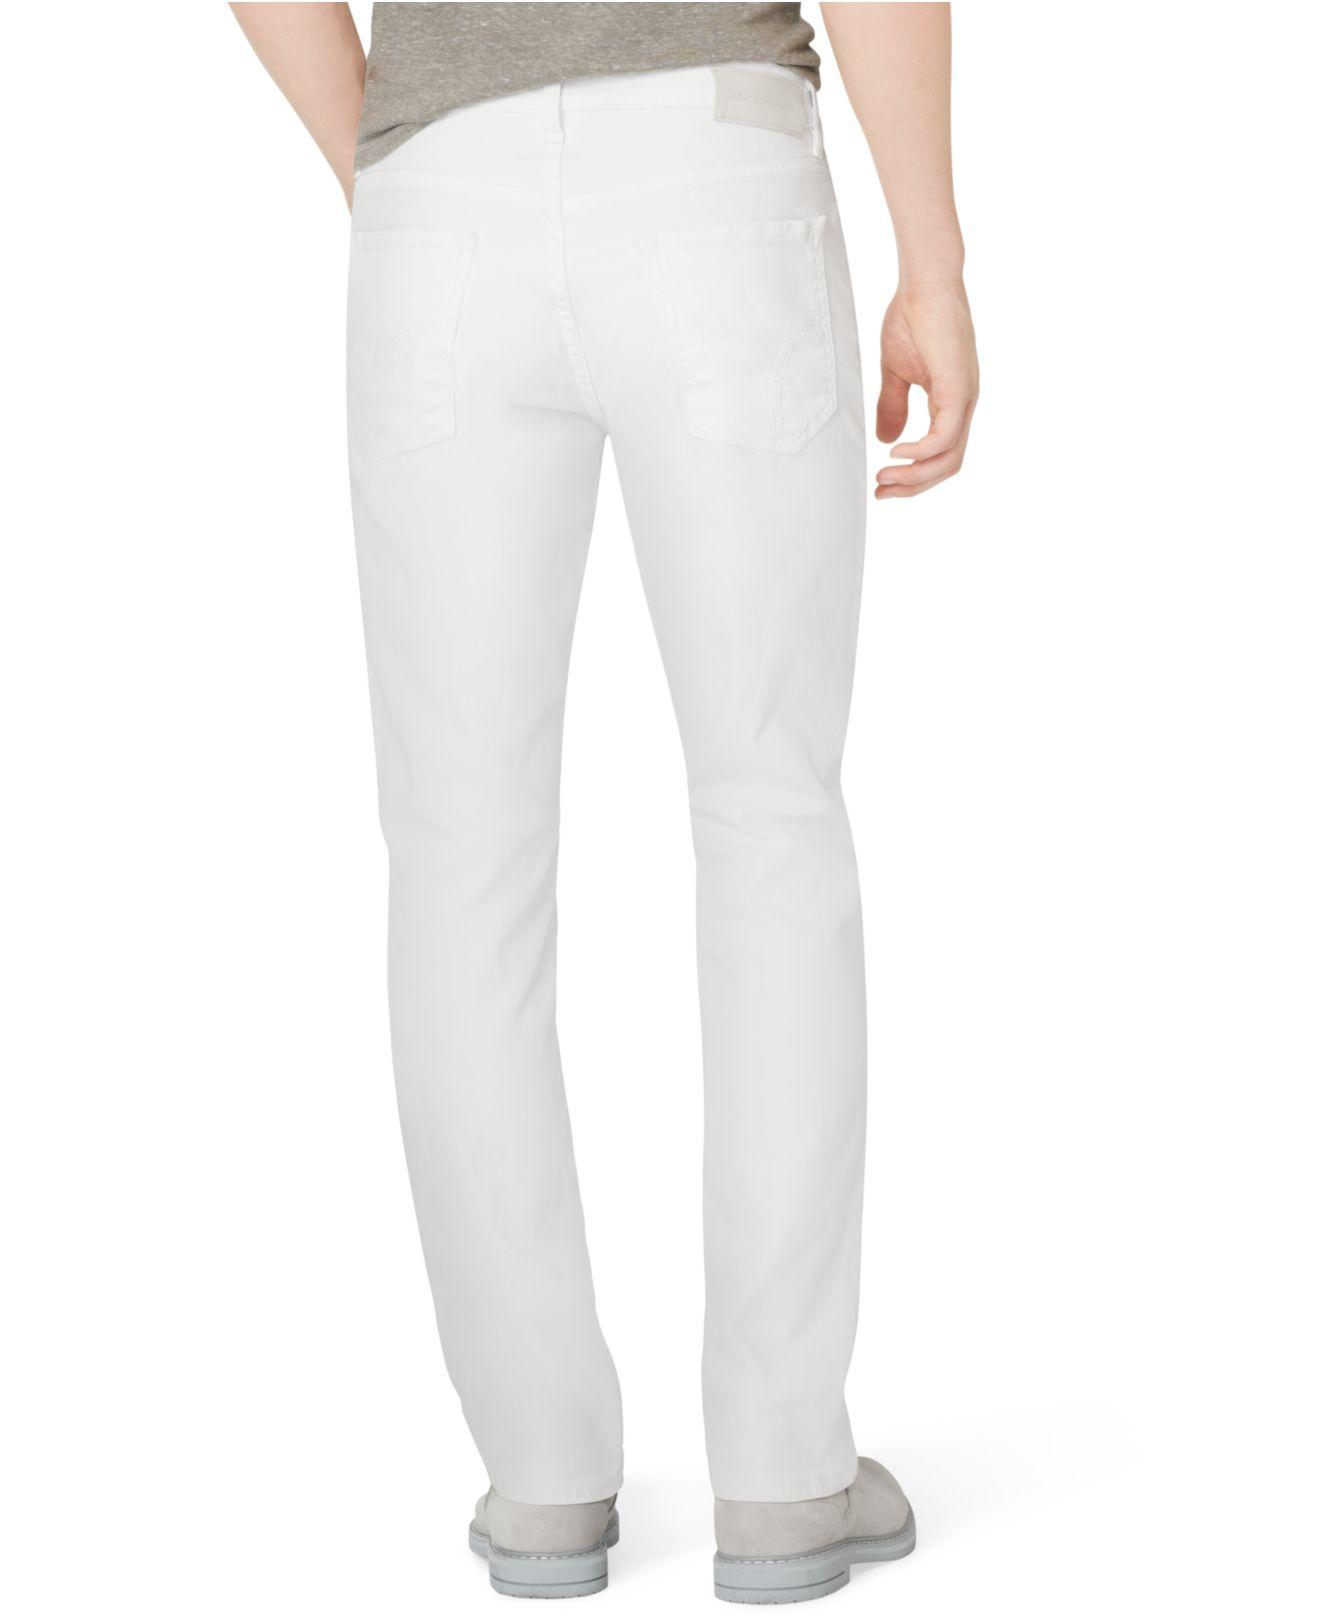 cd953f56f3c Lyst - Calvin Klein Slim-straight Fit Jeans in White for Men